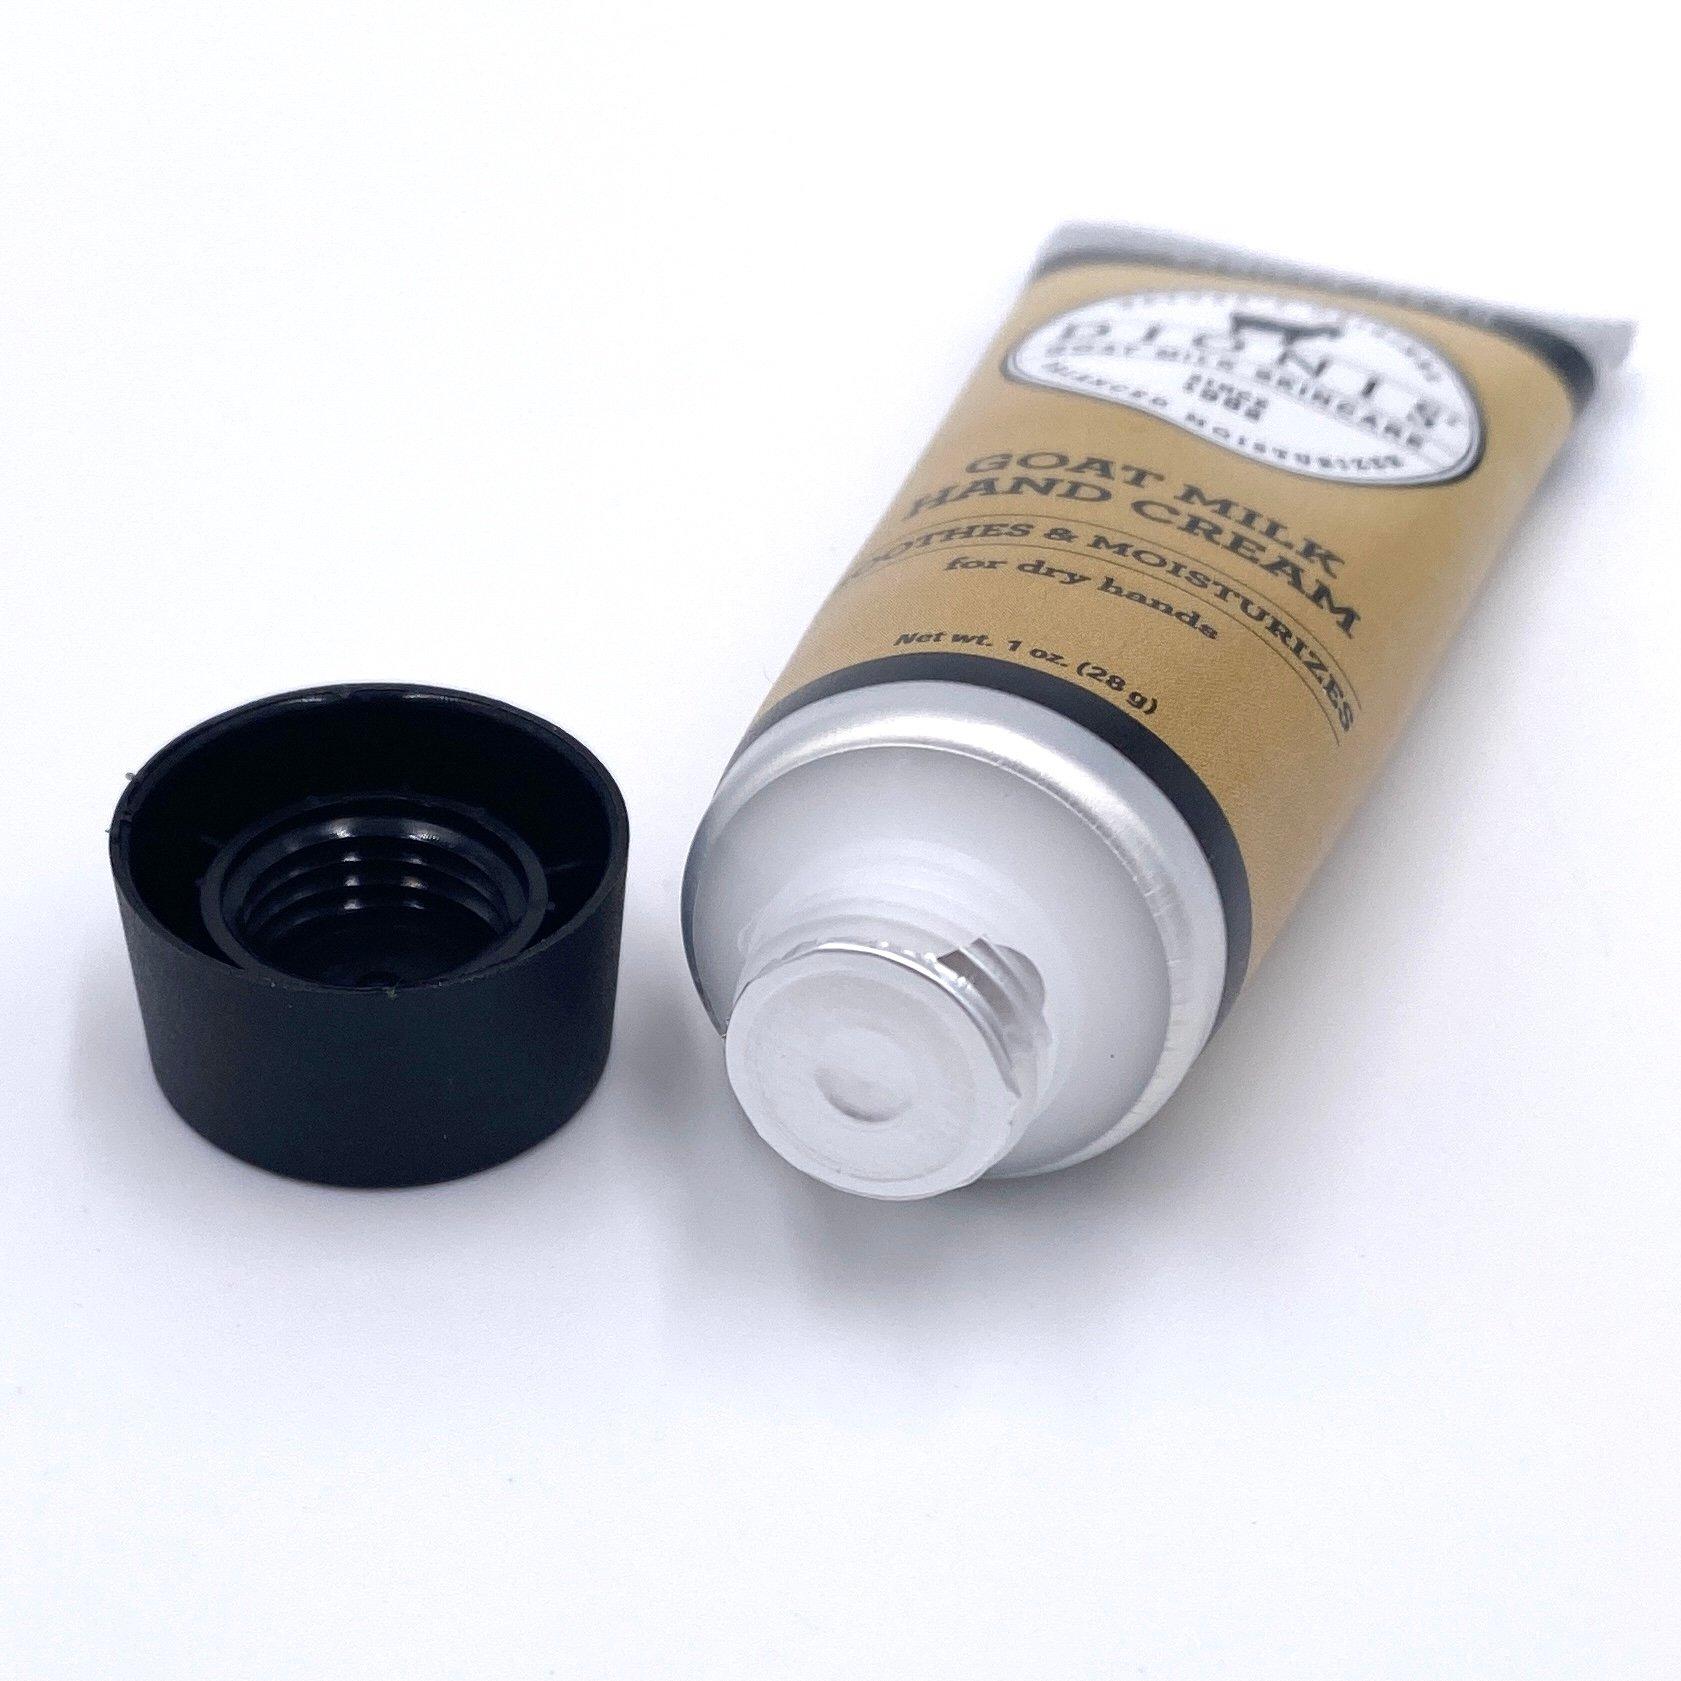 Dionis Vanilla Bean Goat Milk Hand Cream Open for Ipsy Glam Bag March 2021